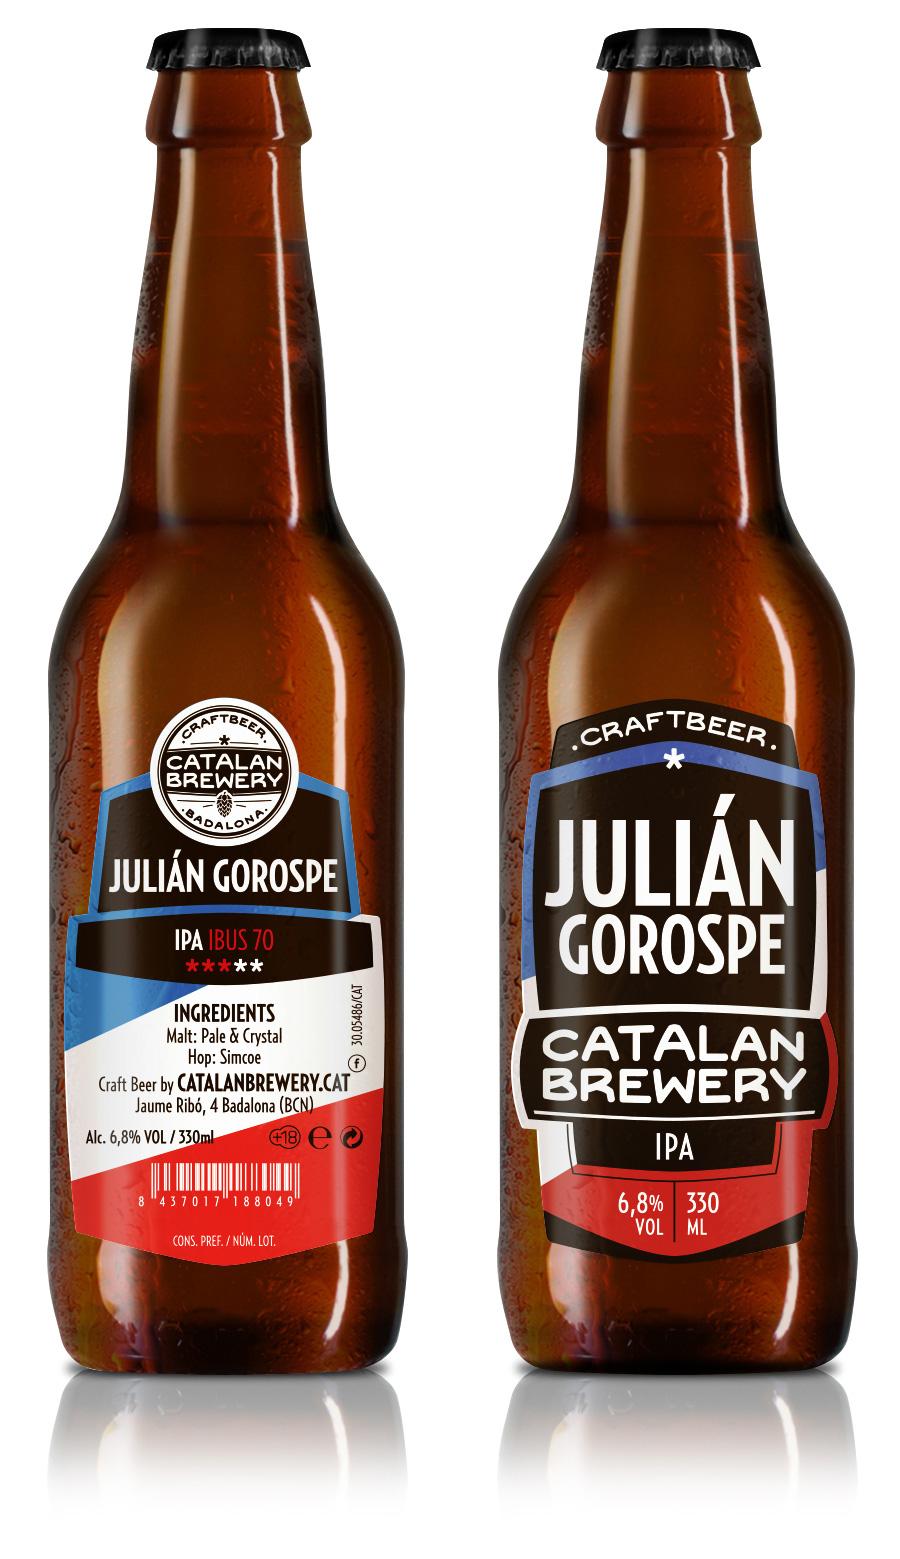 Cerveza artesana Julián Gorospe